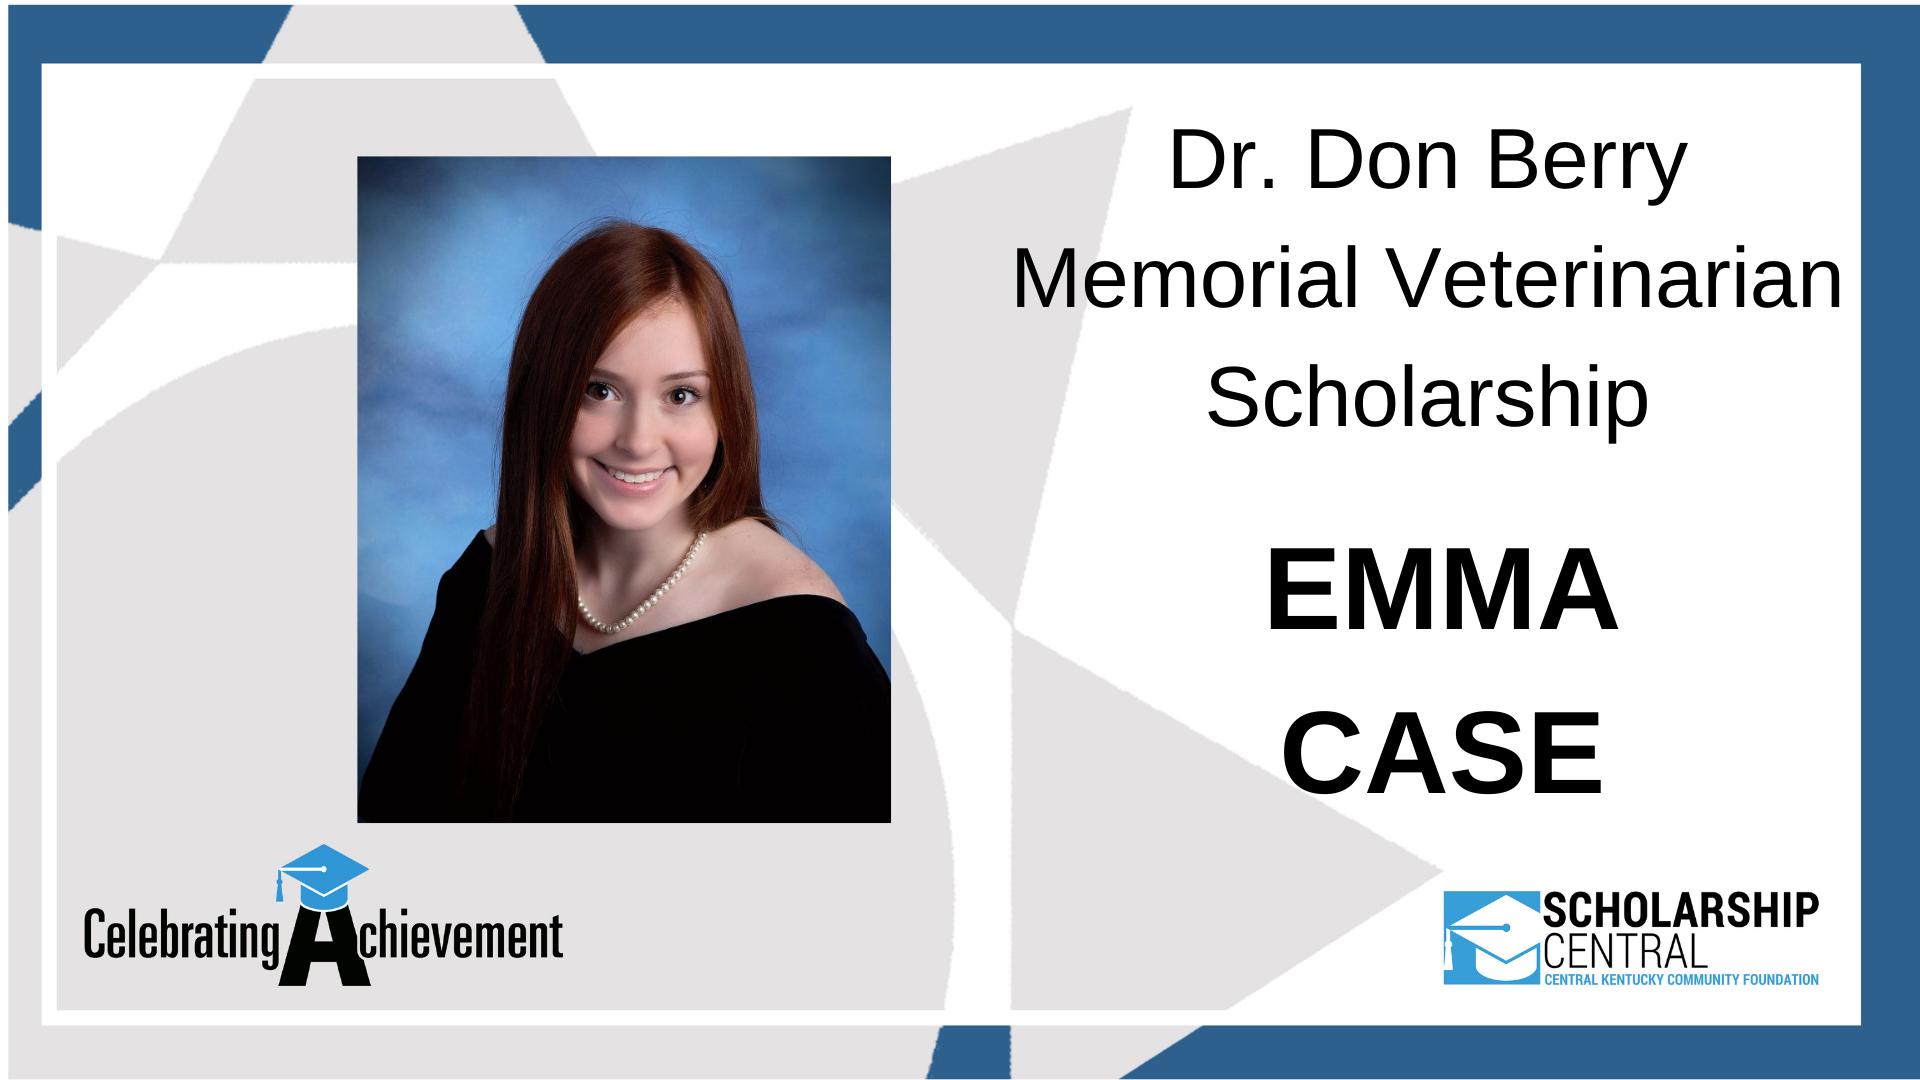 Dr Don Berry Memorial Veterinarian Scholarship Winner